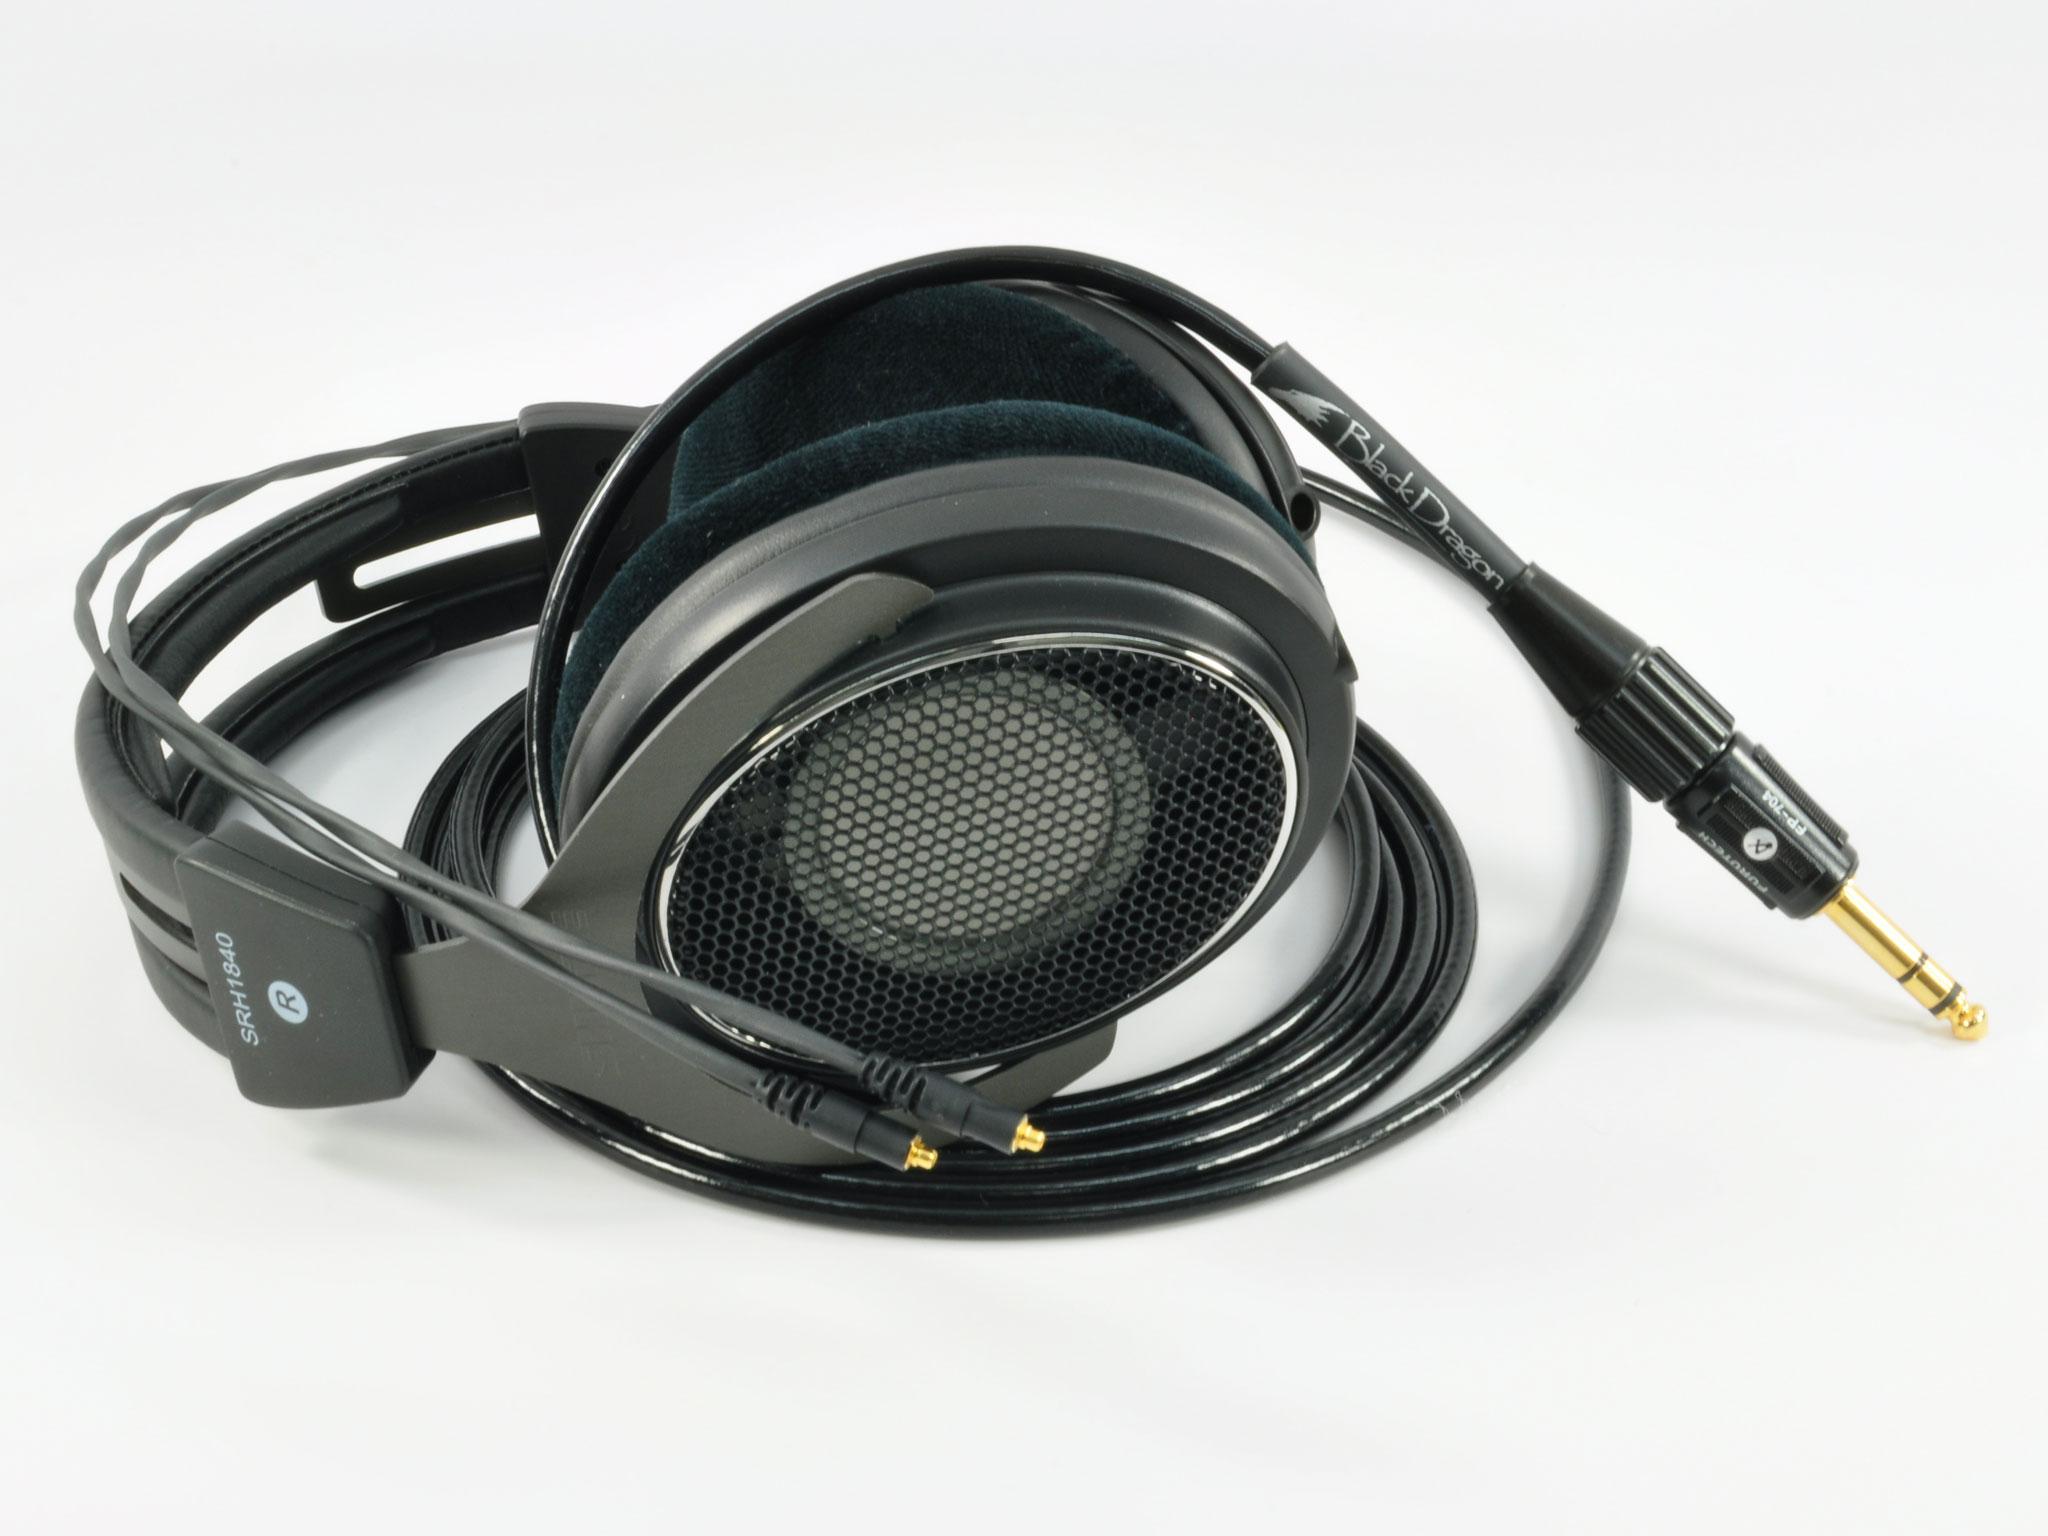 Black Dragon V2 Shure Headphone Cable